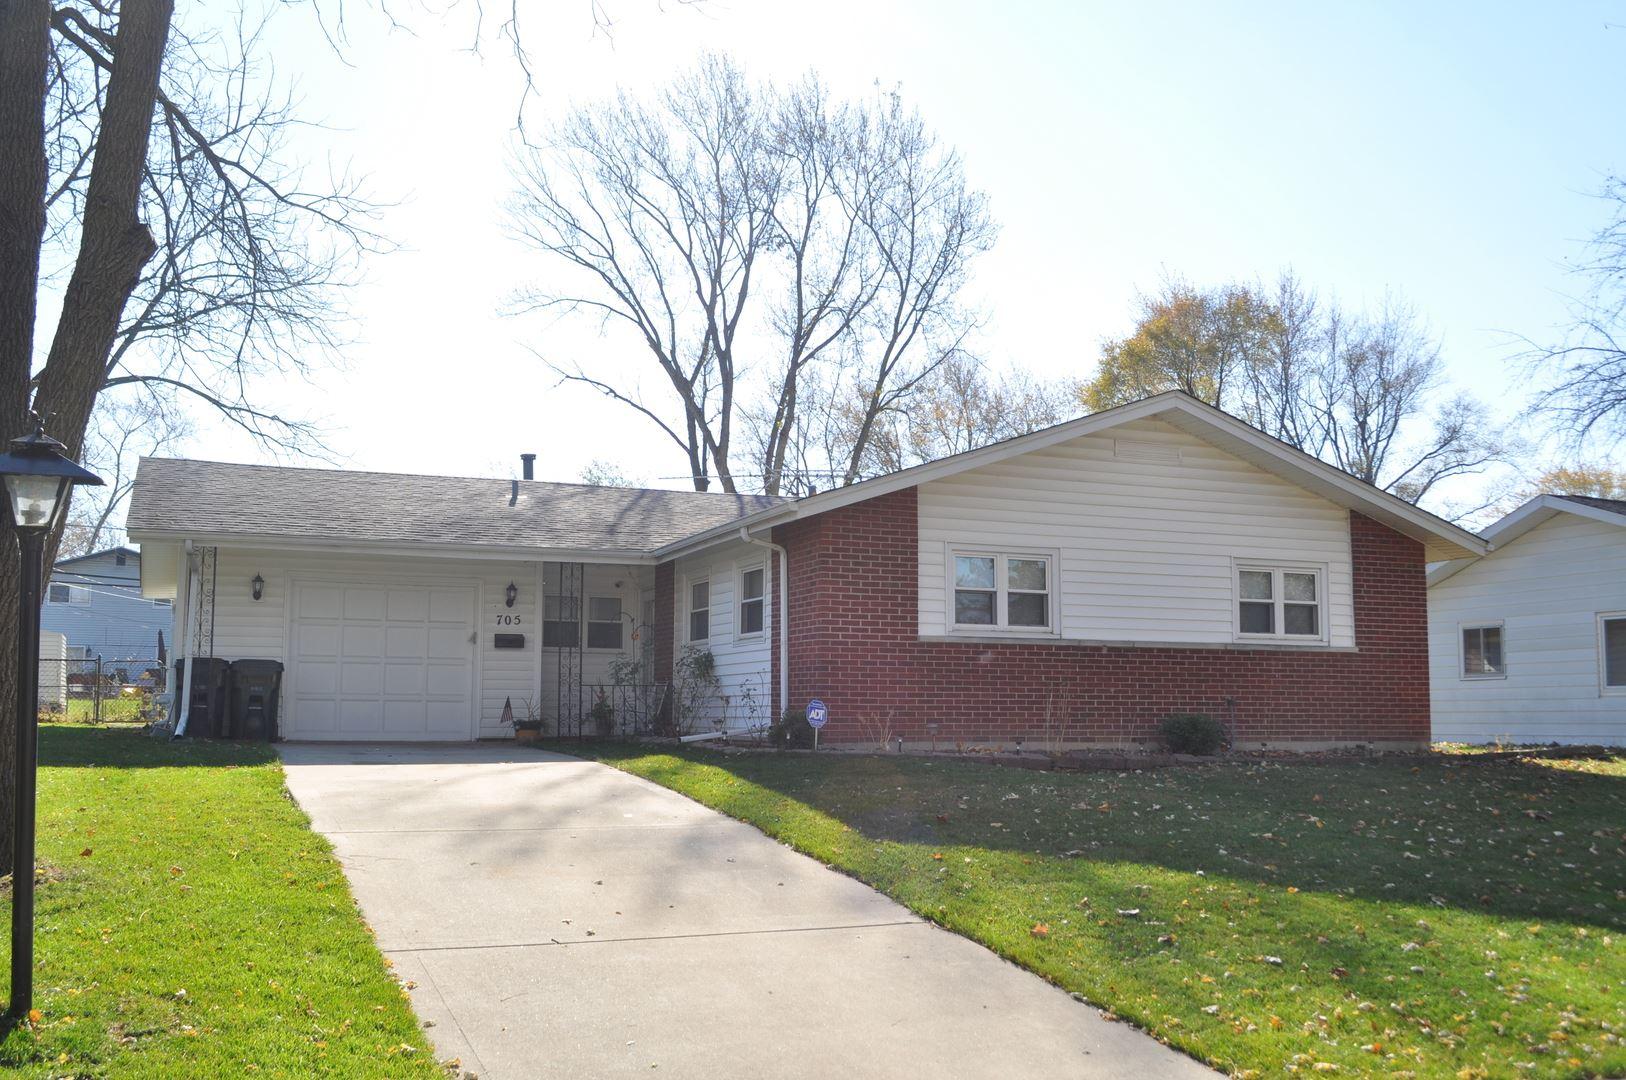 705 Edgemont Lane, Hoffman Estates, IL 60169 - #: 10931786